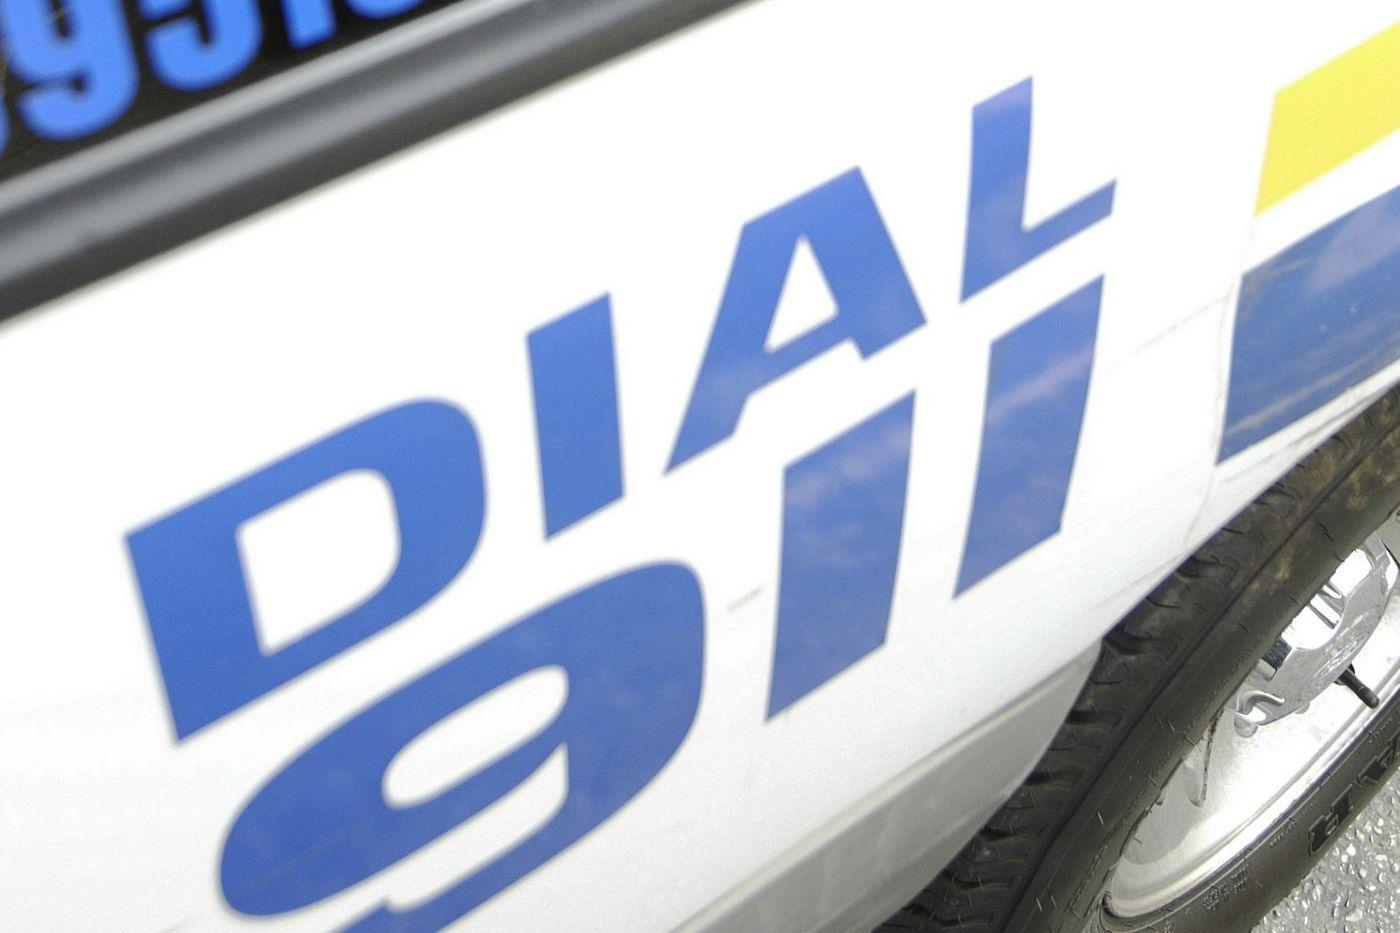 Pedestrian critically injured in Center City hit-and-run